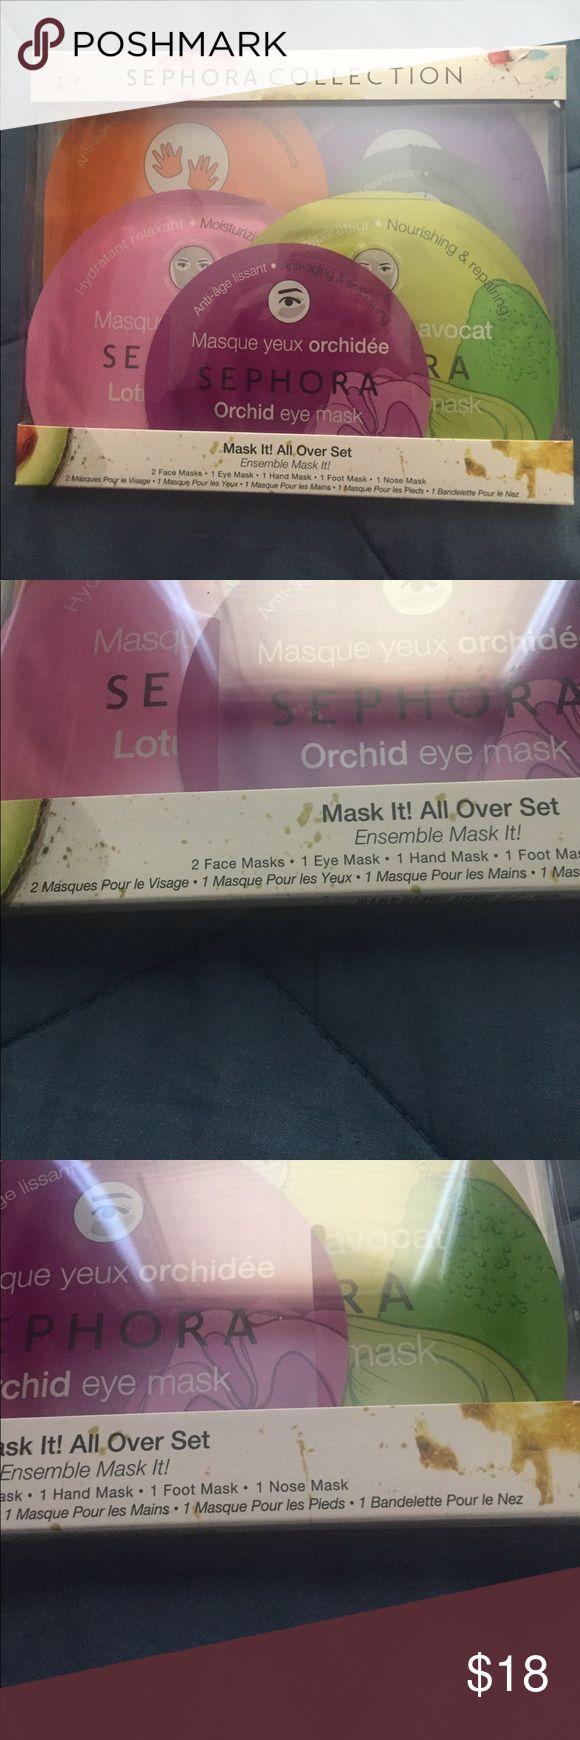 Sephora Mask Set No trades please. Sephora Makeup